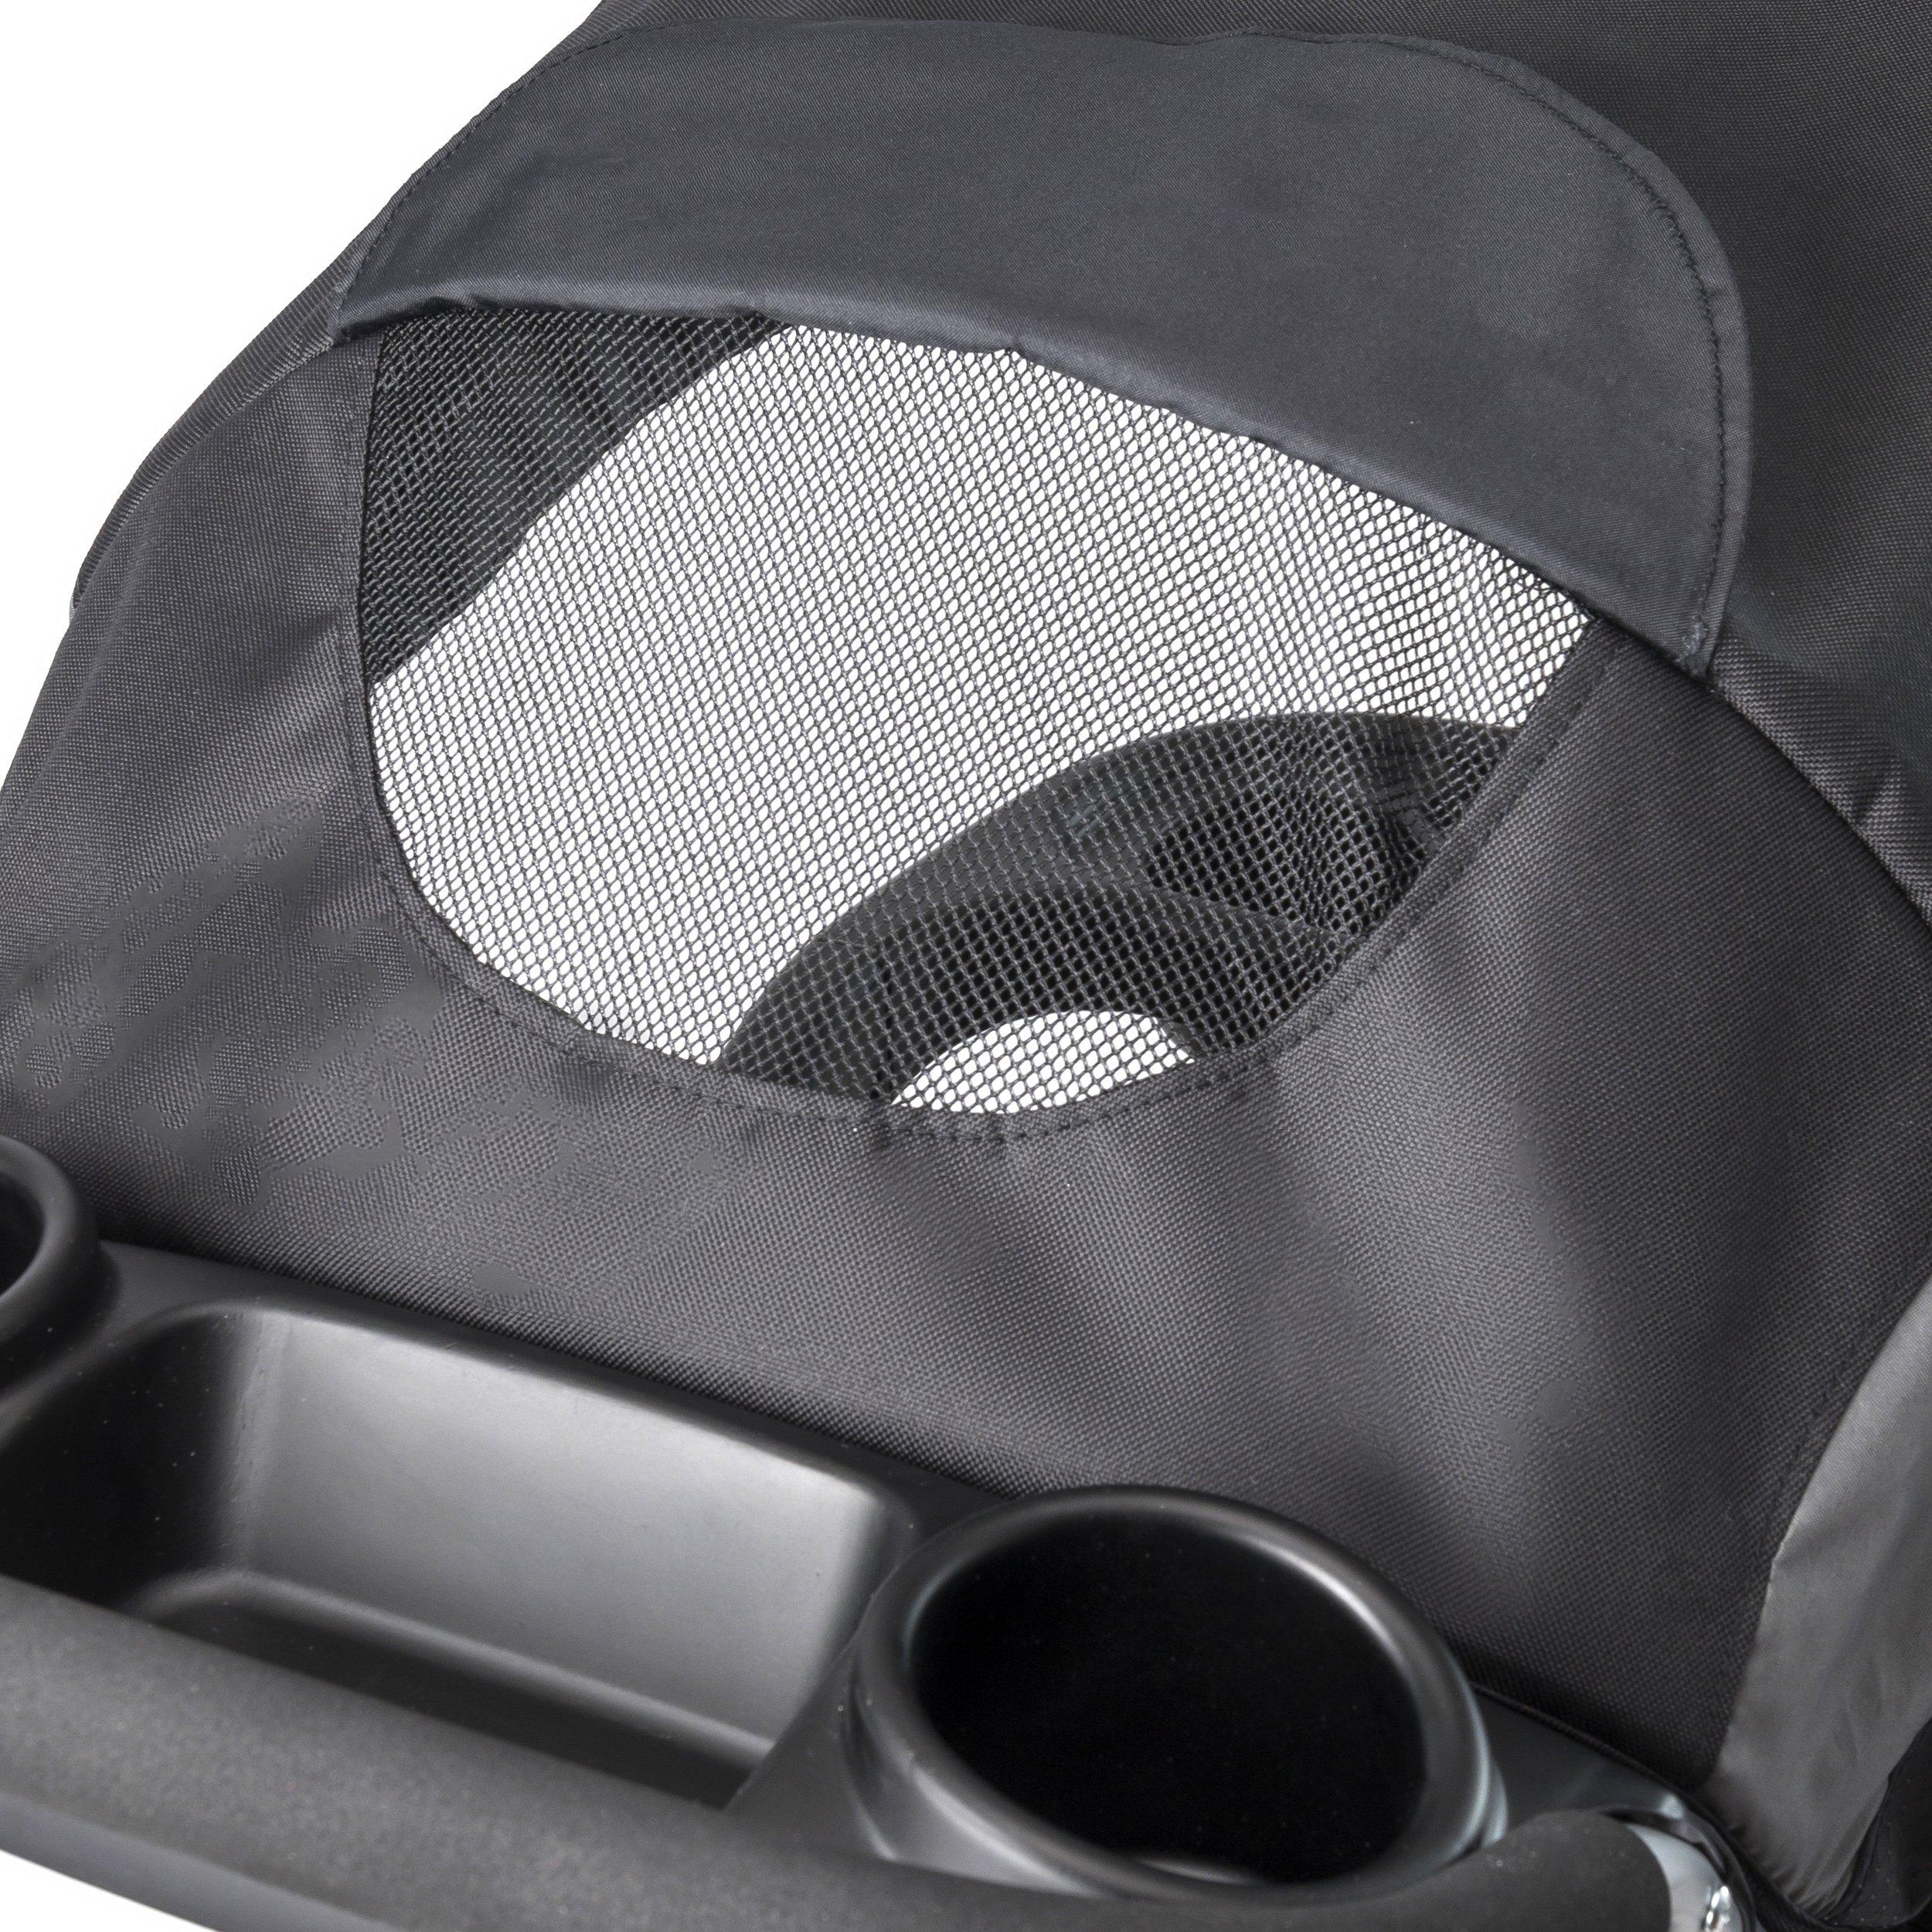 Evenflo Advanced SensorSafe Epic Travel System with LiteMax Infant Car Seat, Jet by Evenflo (Image #9)